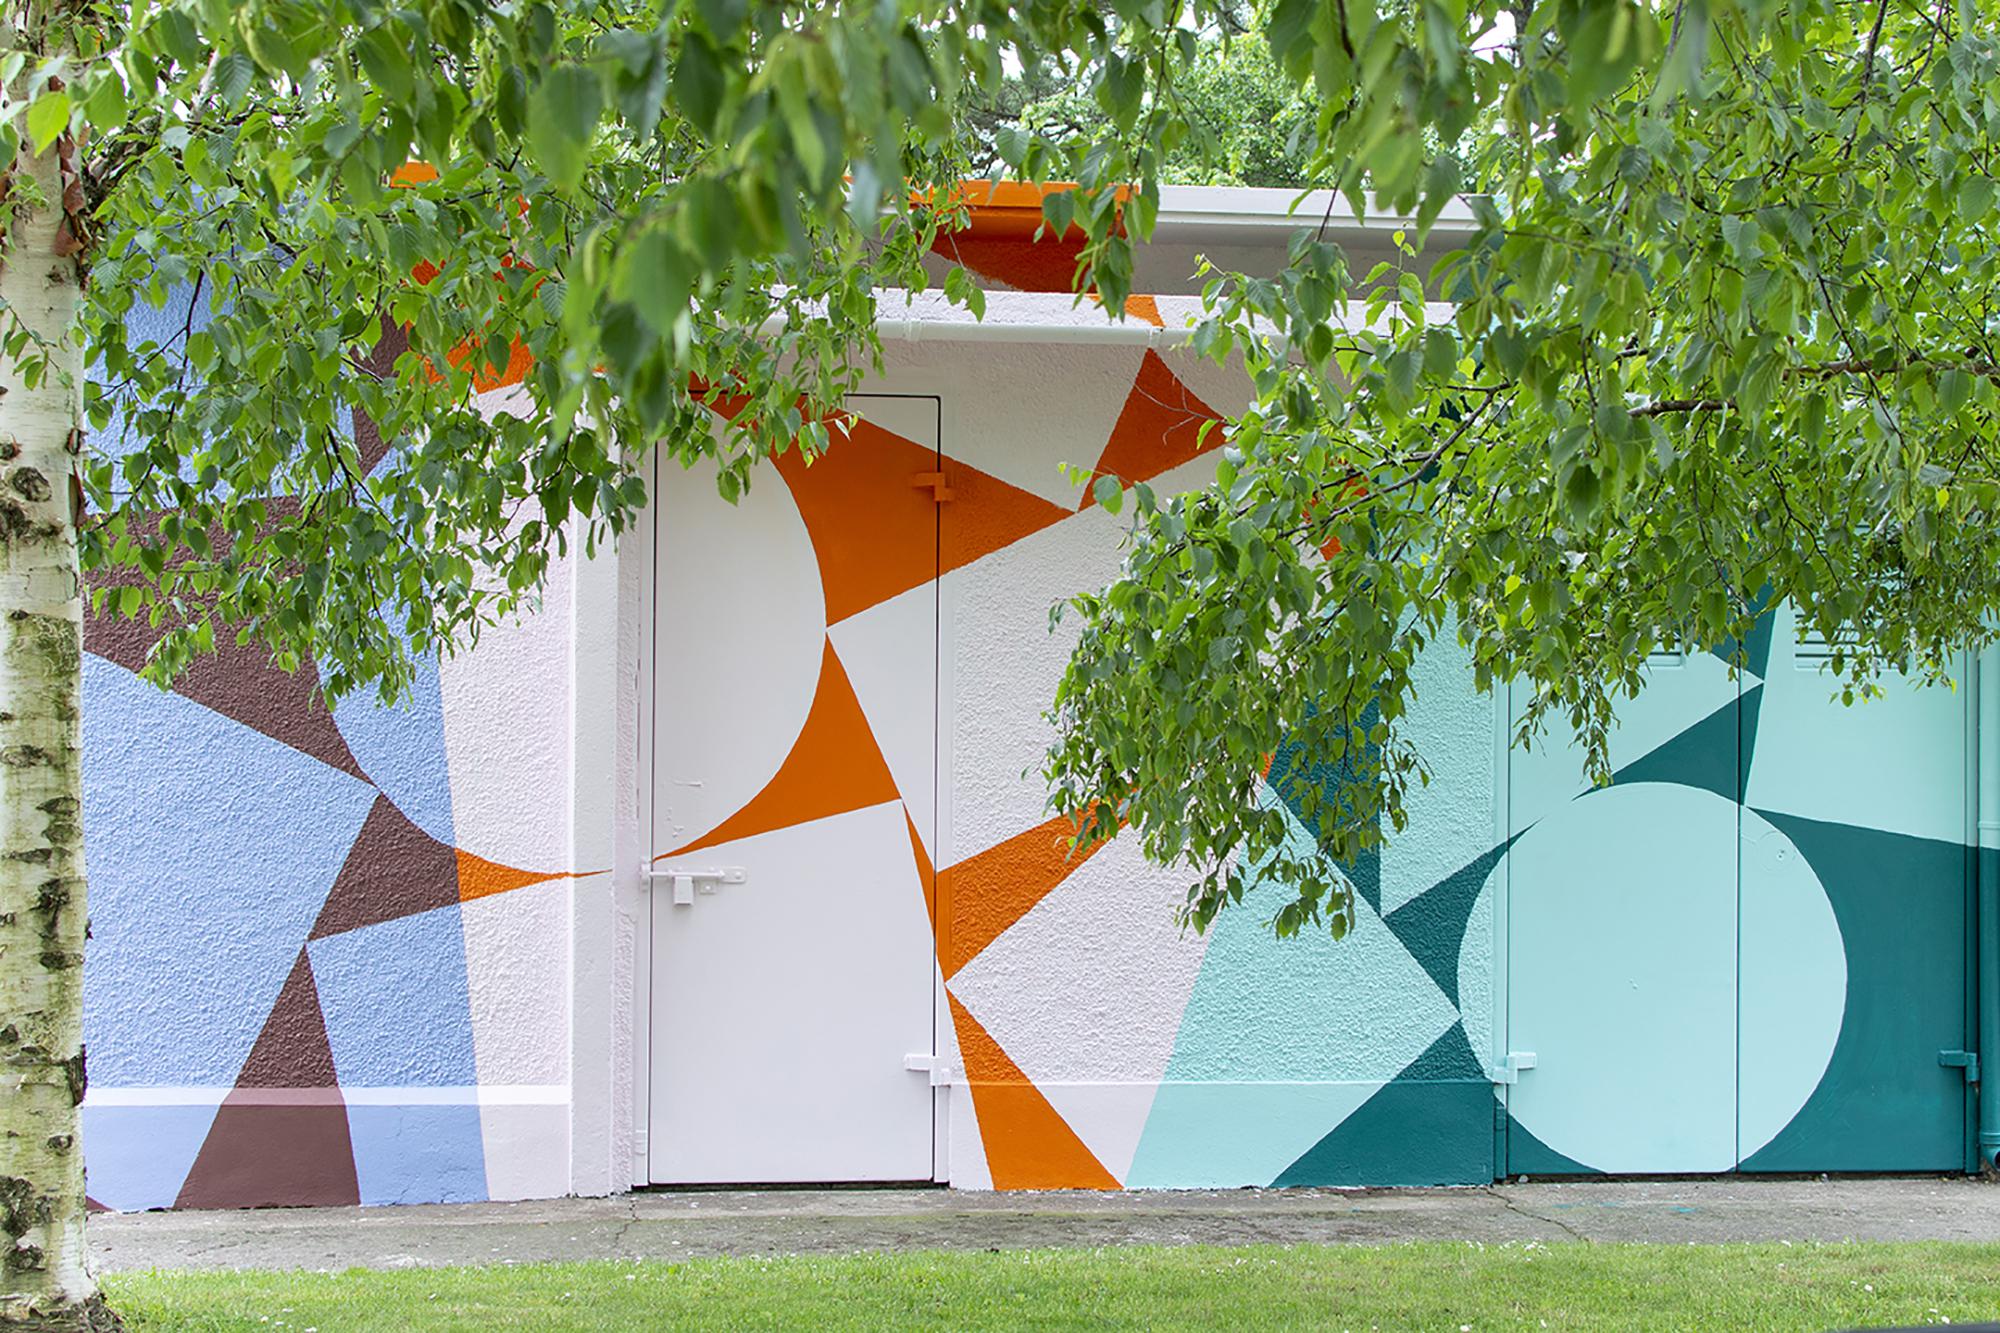 'Bandfield', 2019, Site-specific Mural, Cork City. Photo credit:  Deirdre Breen